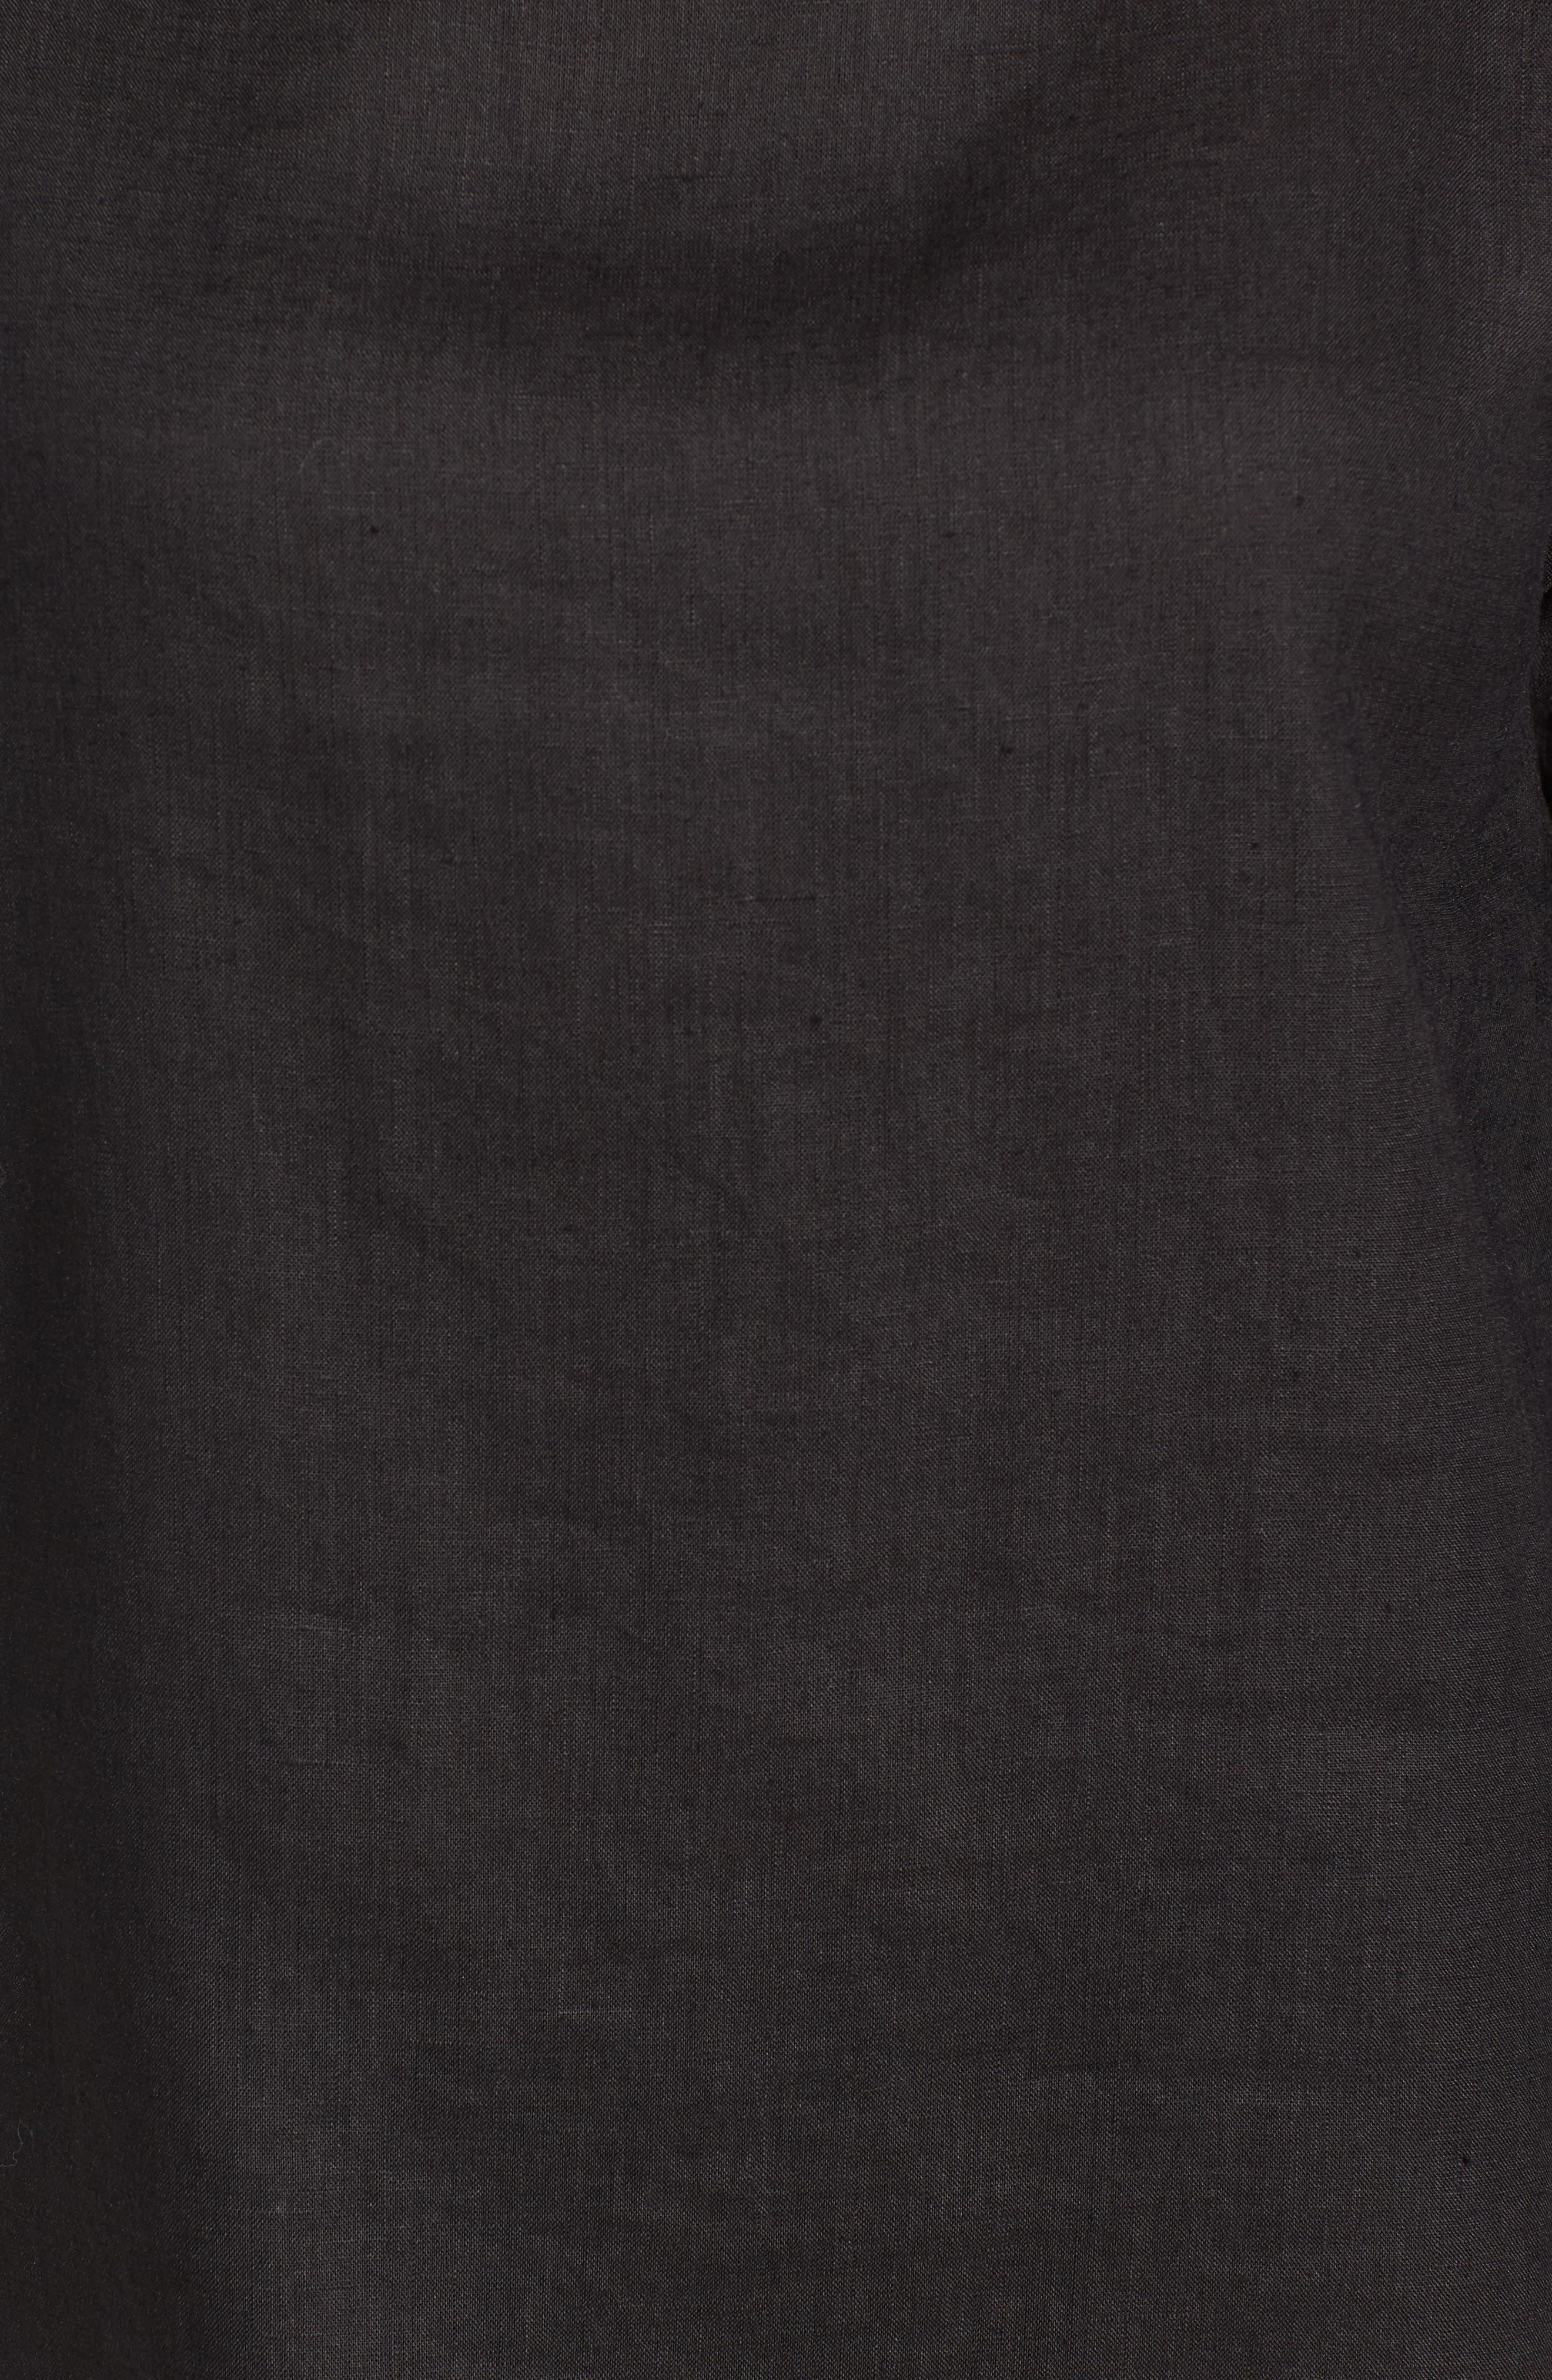 Organic Handkerchief Linen Top,                             Alternate thumbnail 6, color,                             001